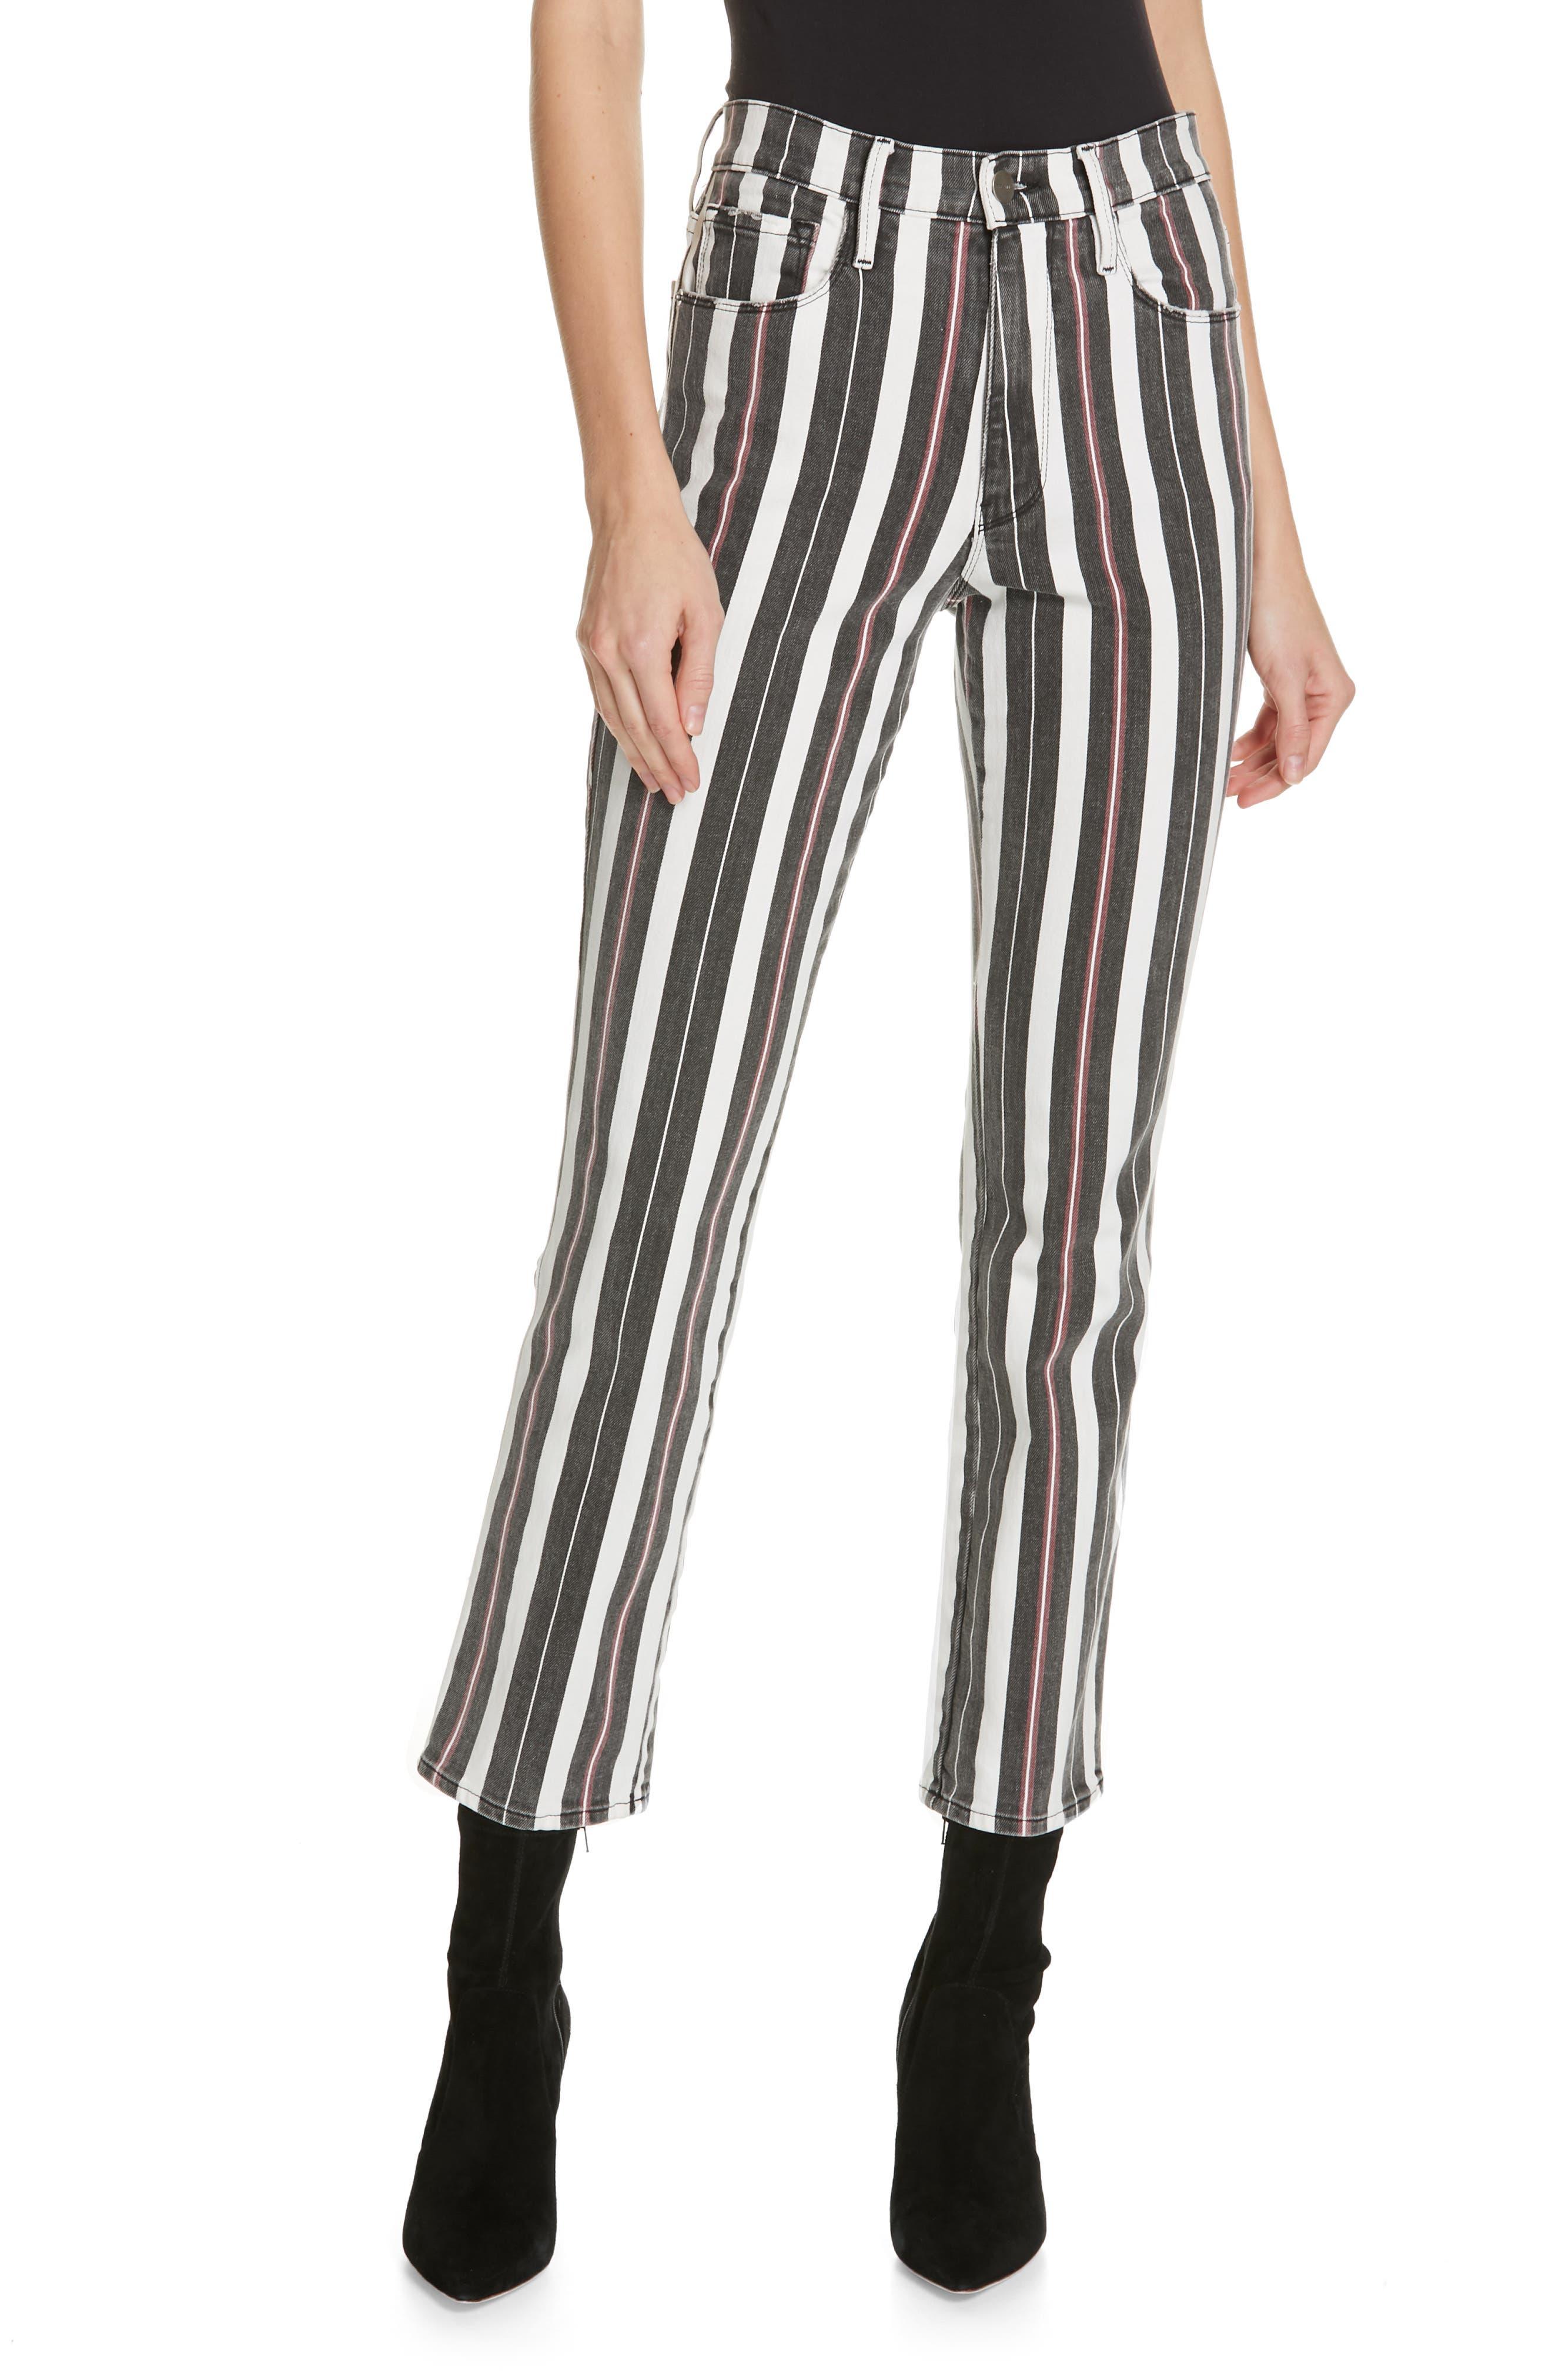 FRAME, Le Sylvie Band Stripe Straight Leg Jeans, Main thumbnail 1, color, BAND STRIPE